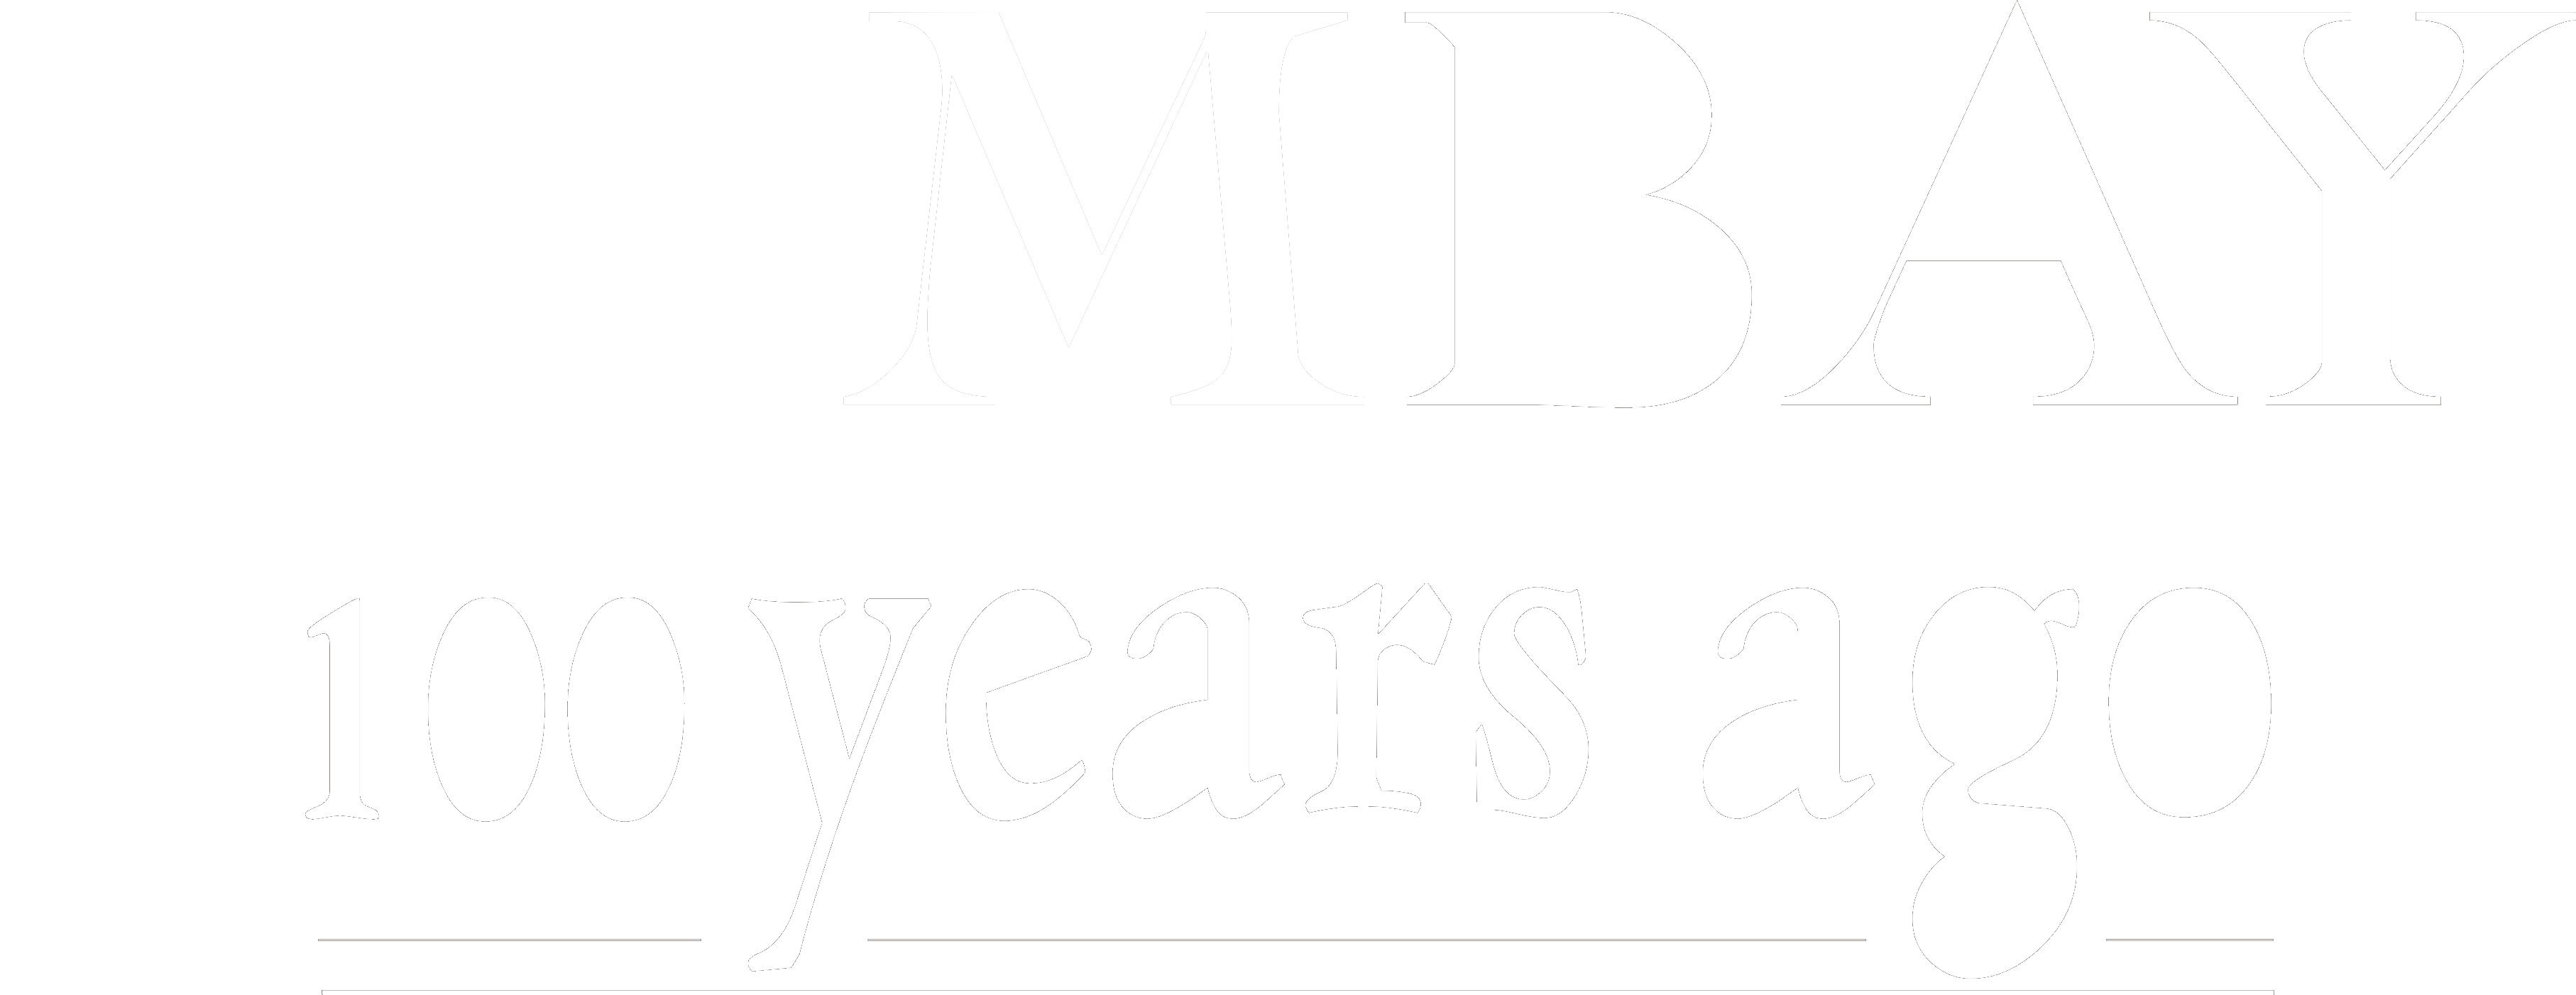 Bombay 100 Years Ago